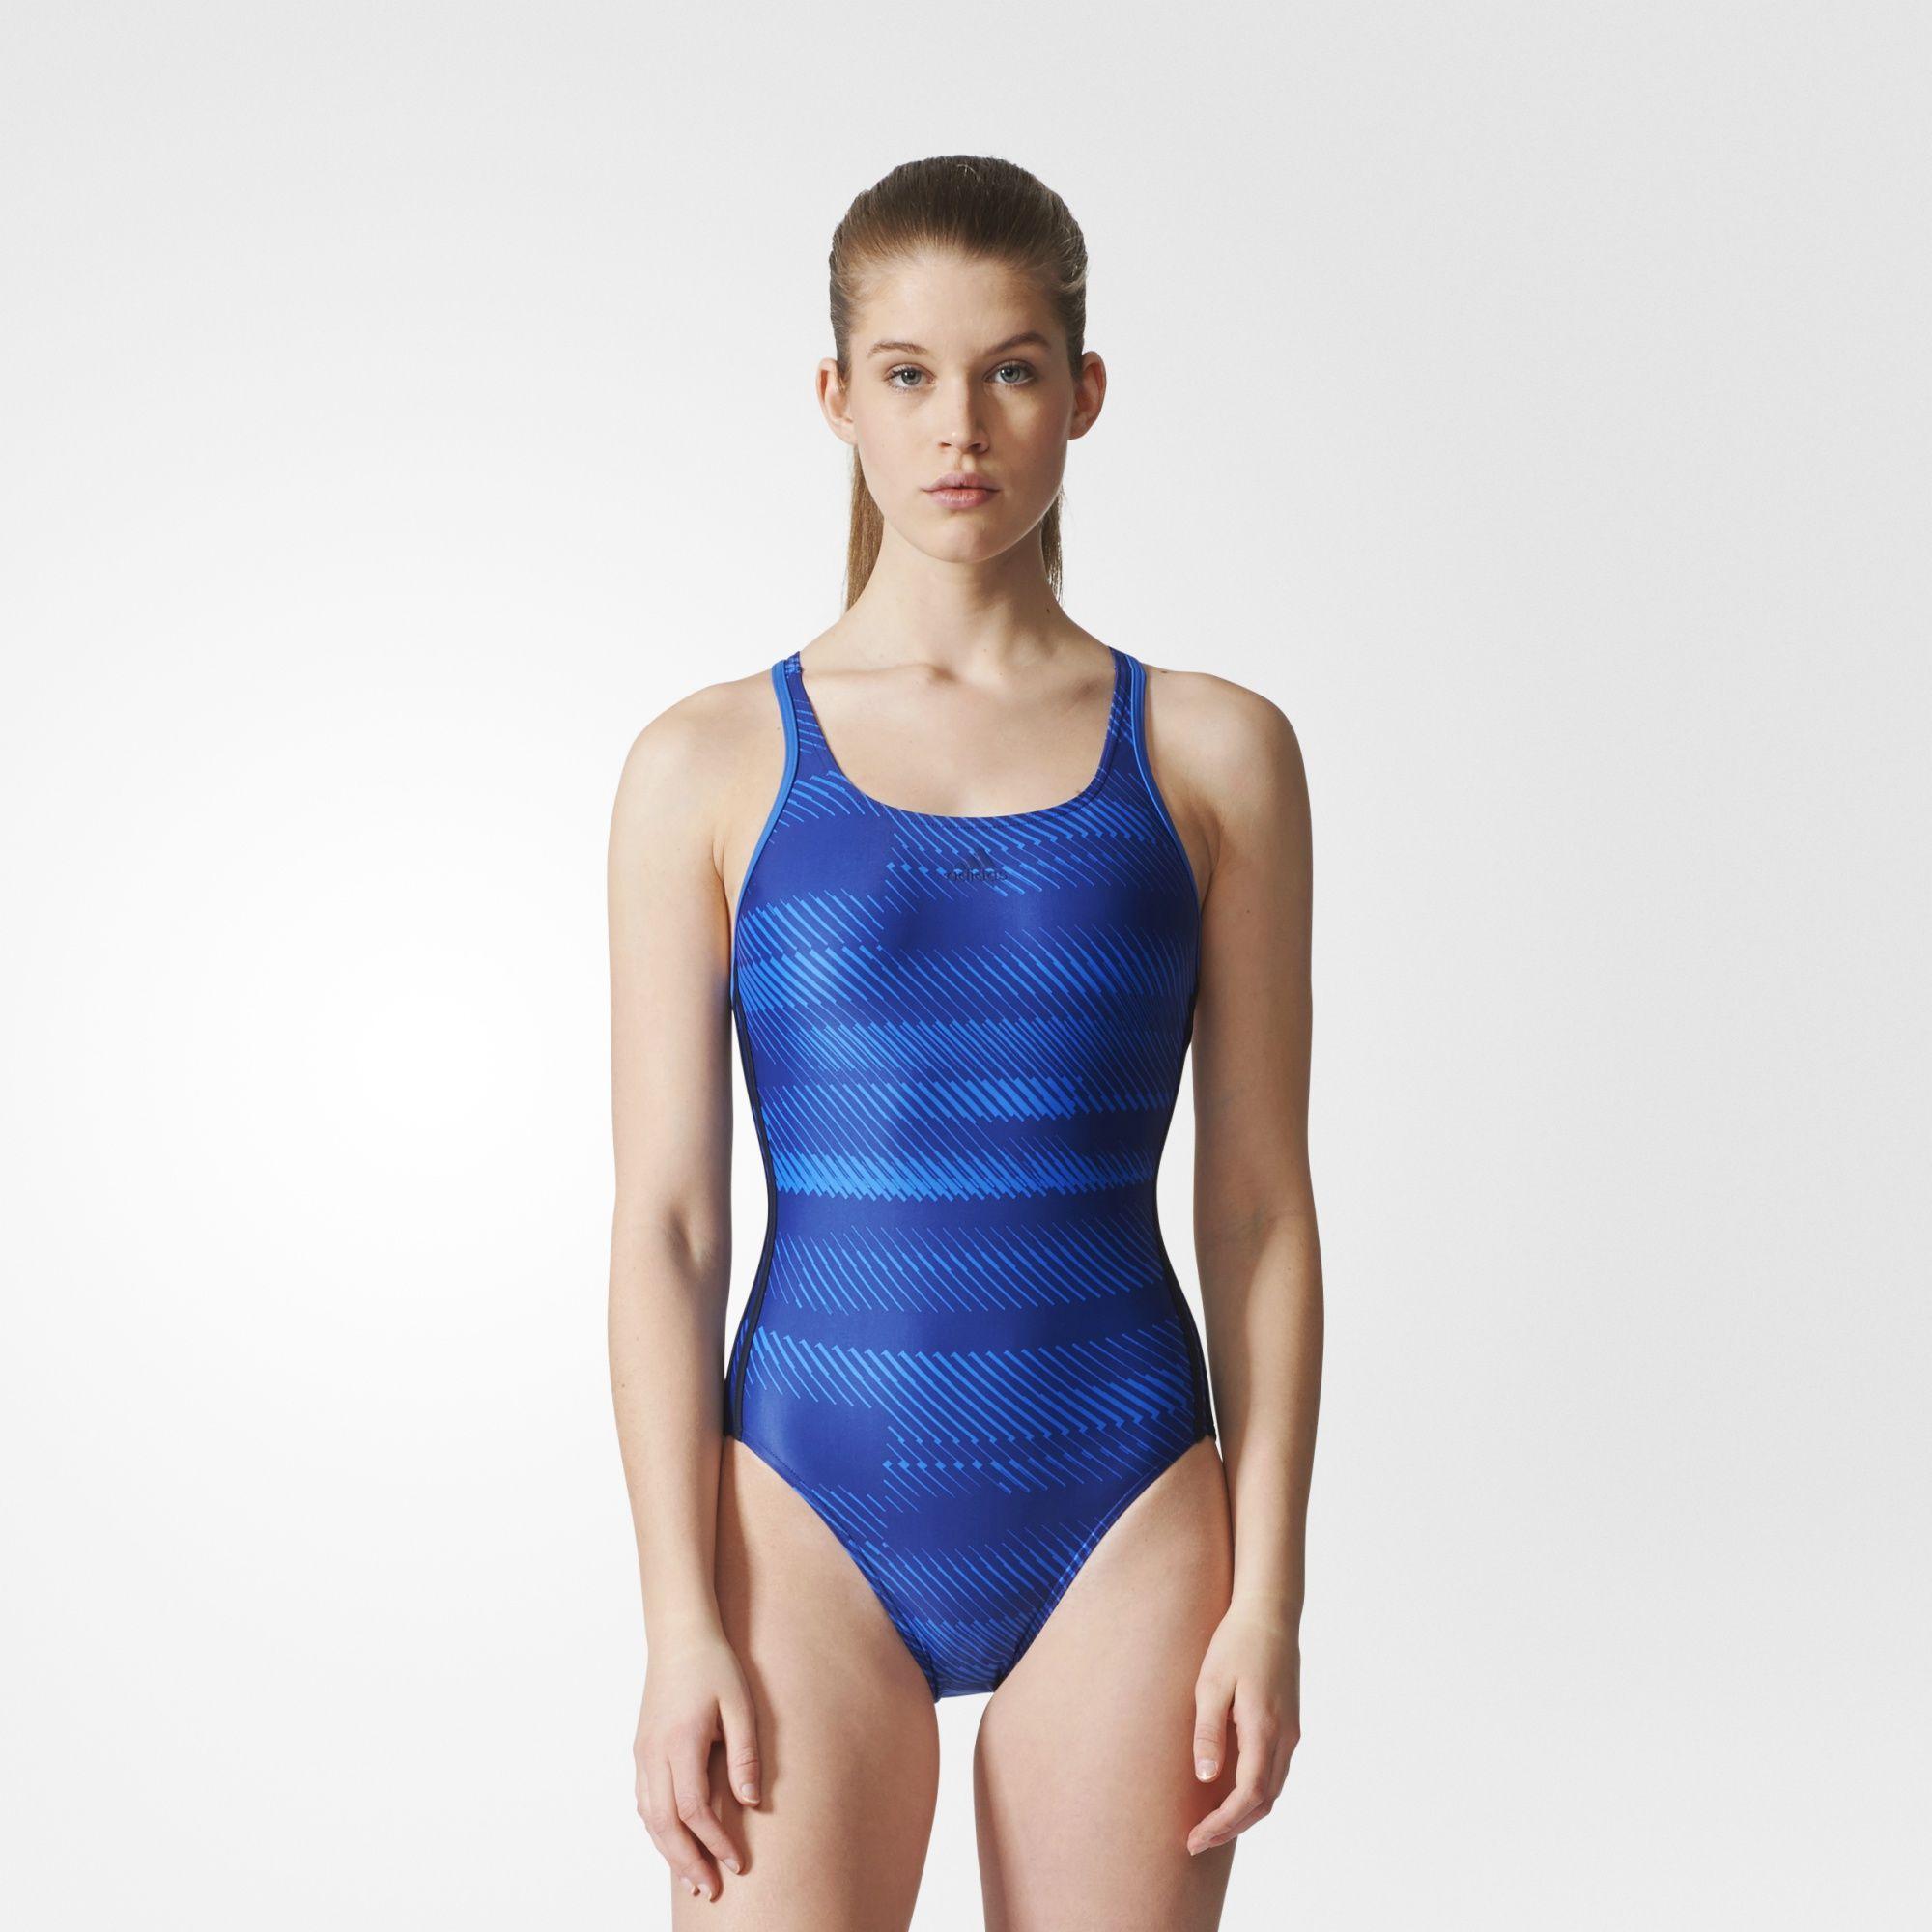 Damen 3-Streifen Graphic Badeanzug, ENEAQU/BLUE/LEGINK, 40